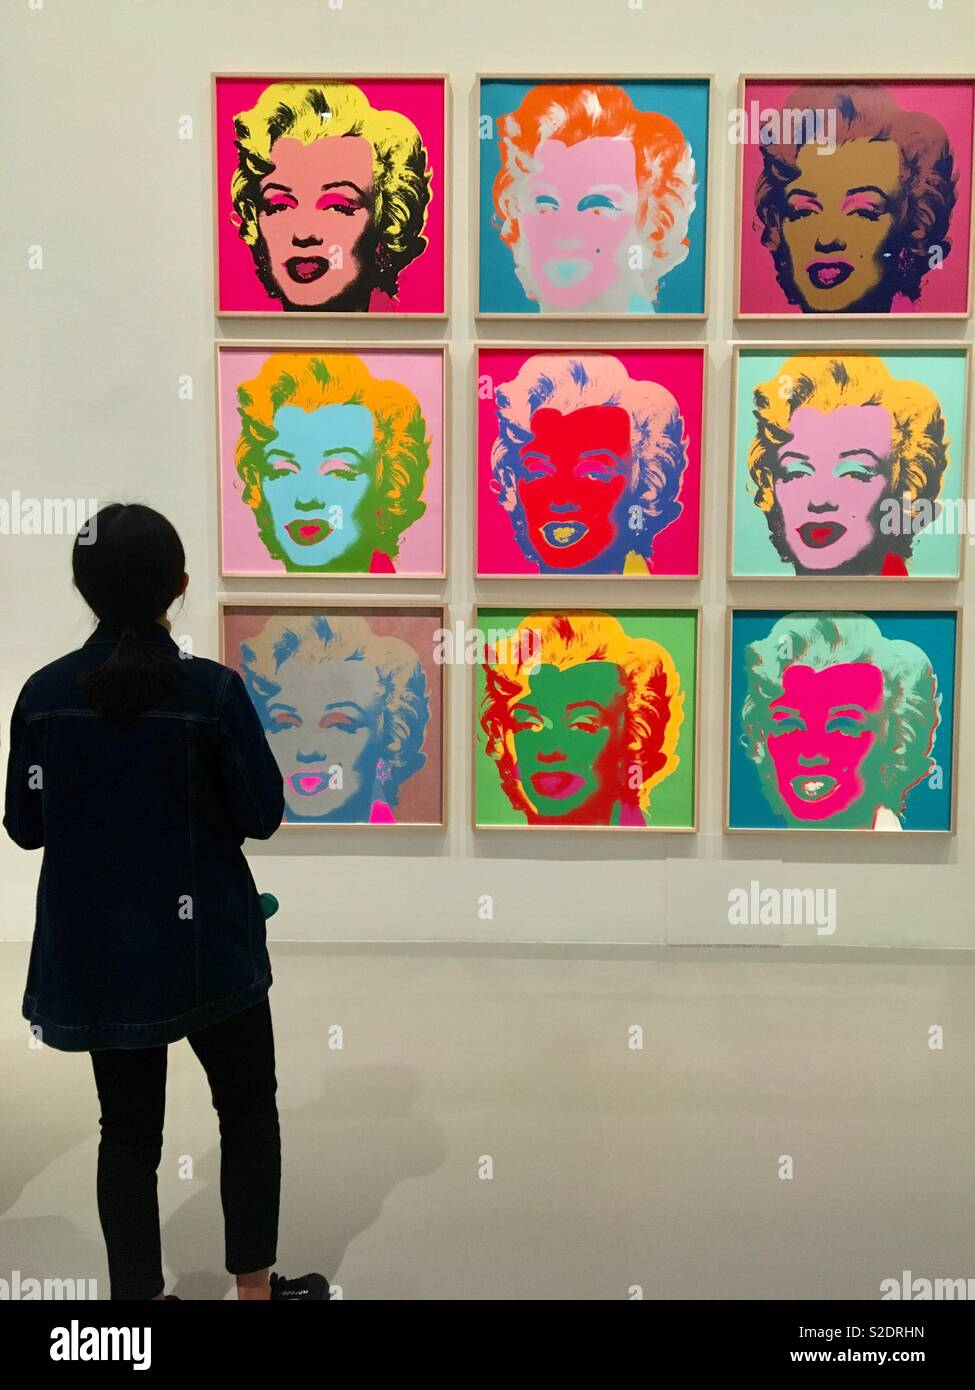 Personne A La Peinture D Andy Warhol A Marilyn Monroe Dans Art Gallery Photo Stock Alamy